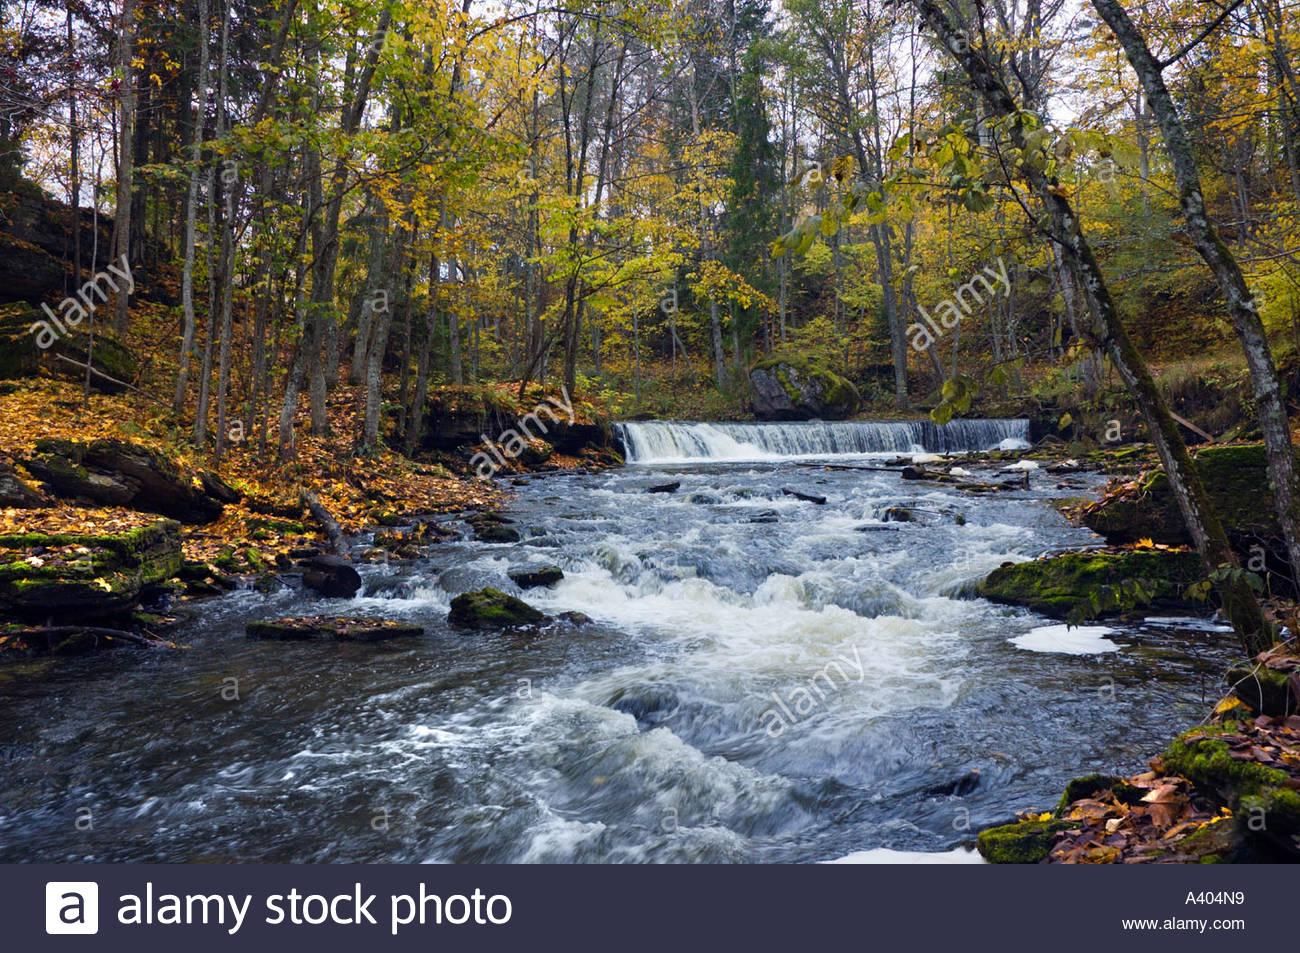 Europe eu estonia lahemaa national park nommeveski n mmeveski waterfall river valgejogi valgej gi colorful autumn